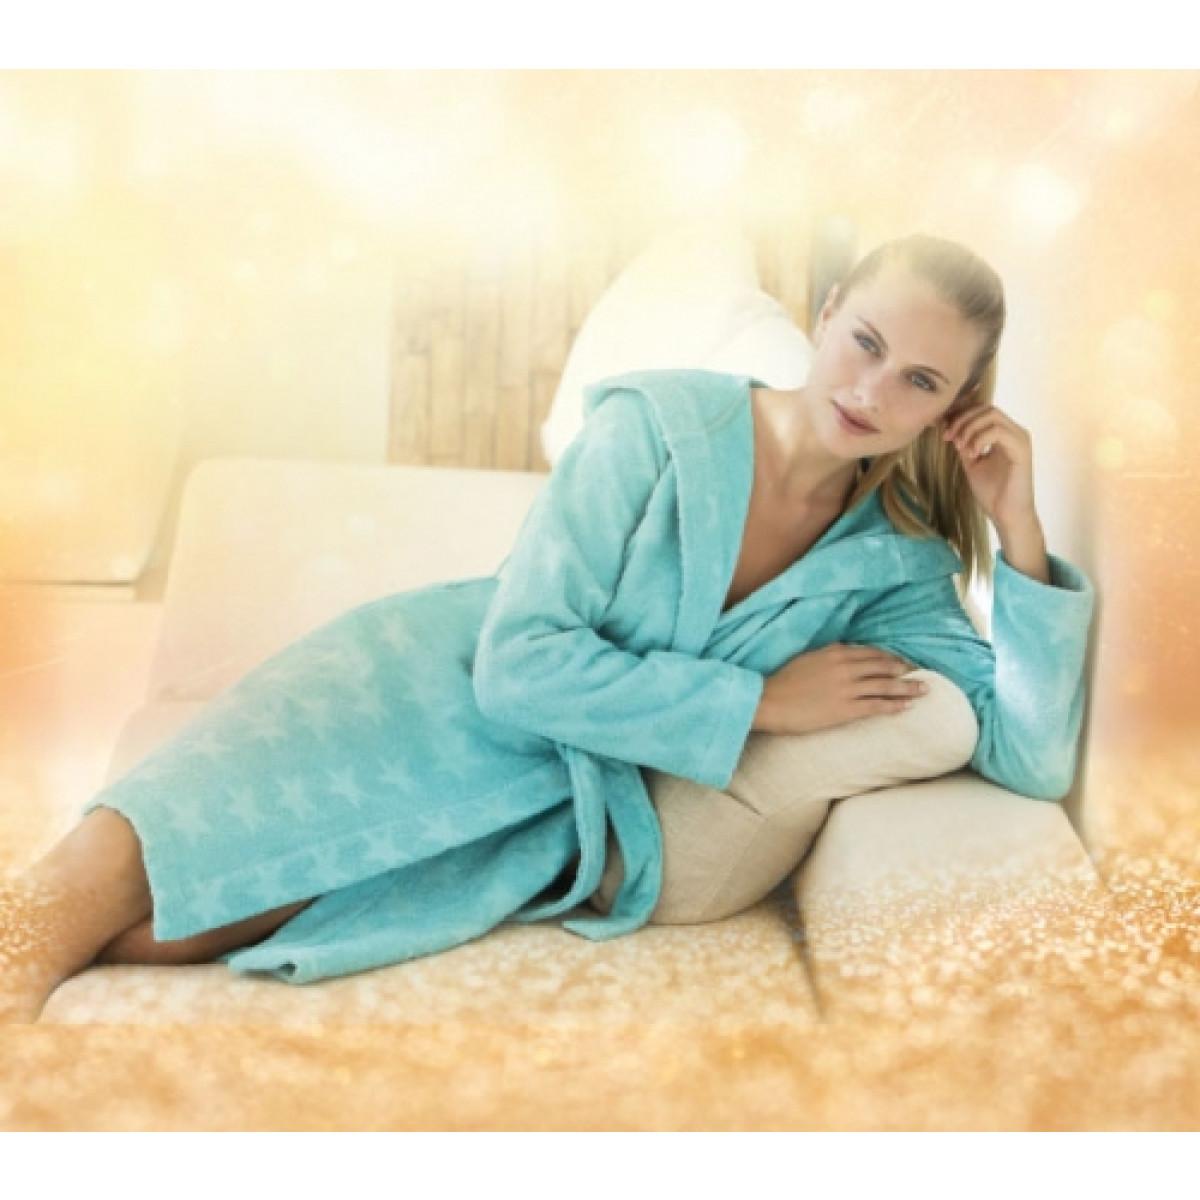 Vossen damesbadjas turquoise